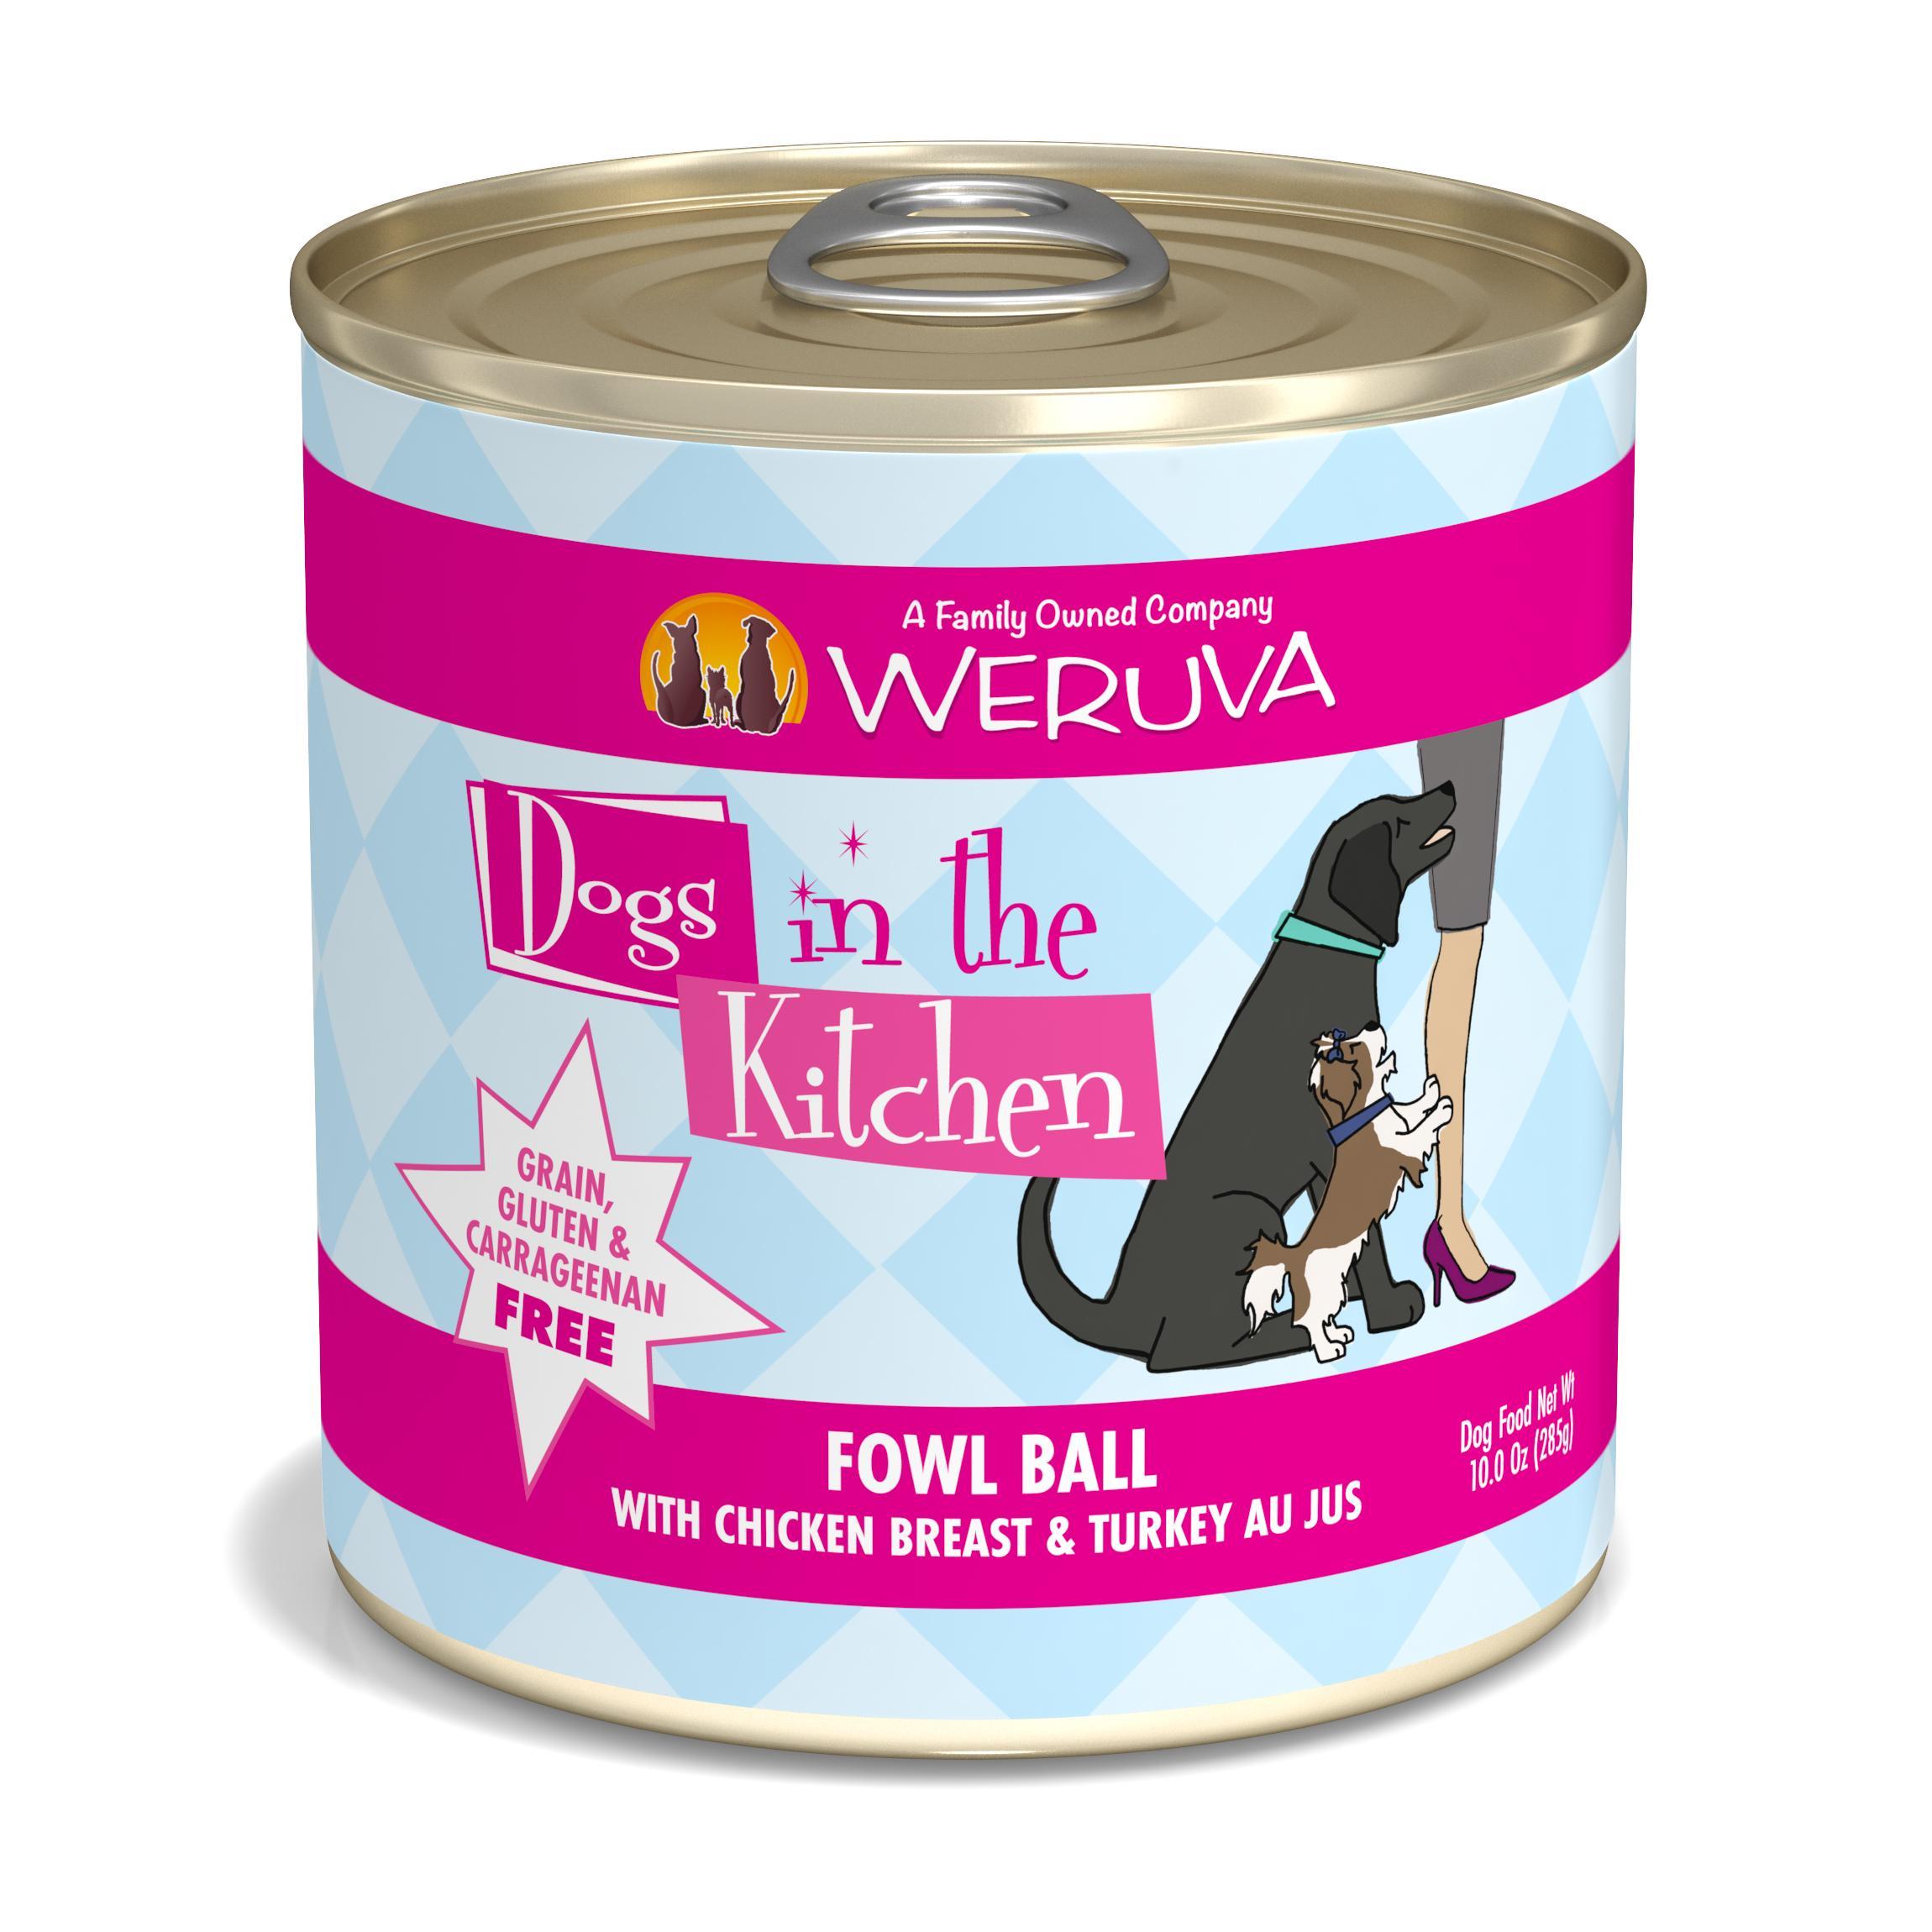 Weruva Dogs in the Kitchen Fowl Ball with Chicken Breast & Turkey Au Jus Grain-Free Wet Dog Food Image